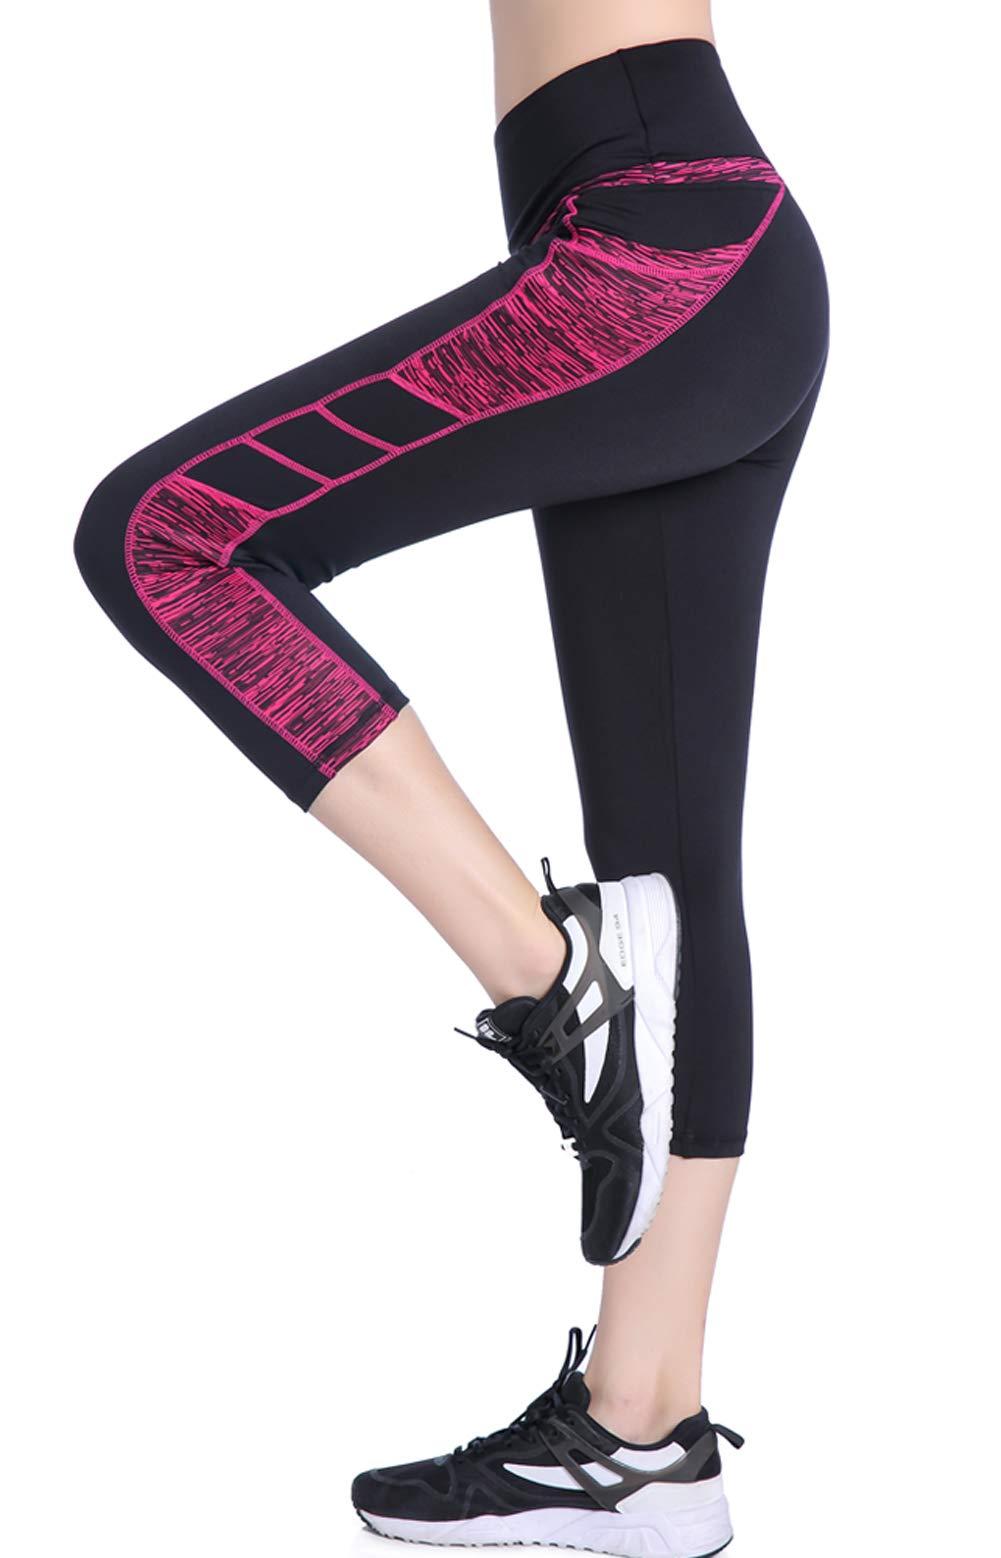 Picotee Women's Yoga Capri Pants Workout Running Leggings Tights High Waist with Pocket (M)